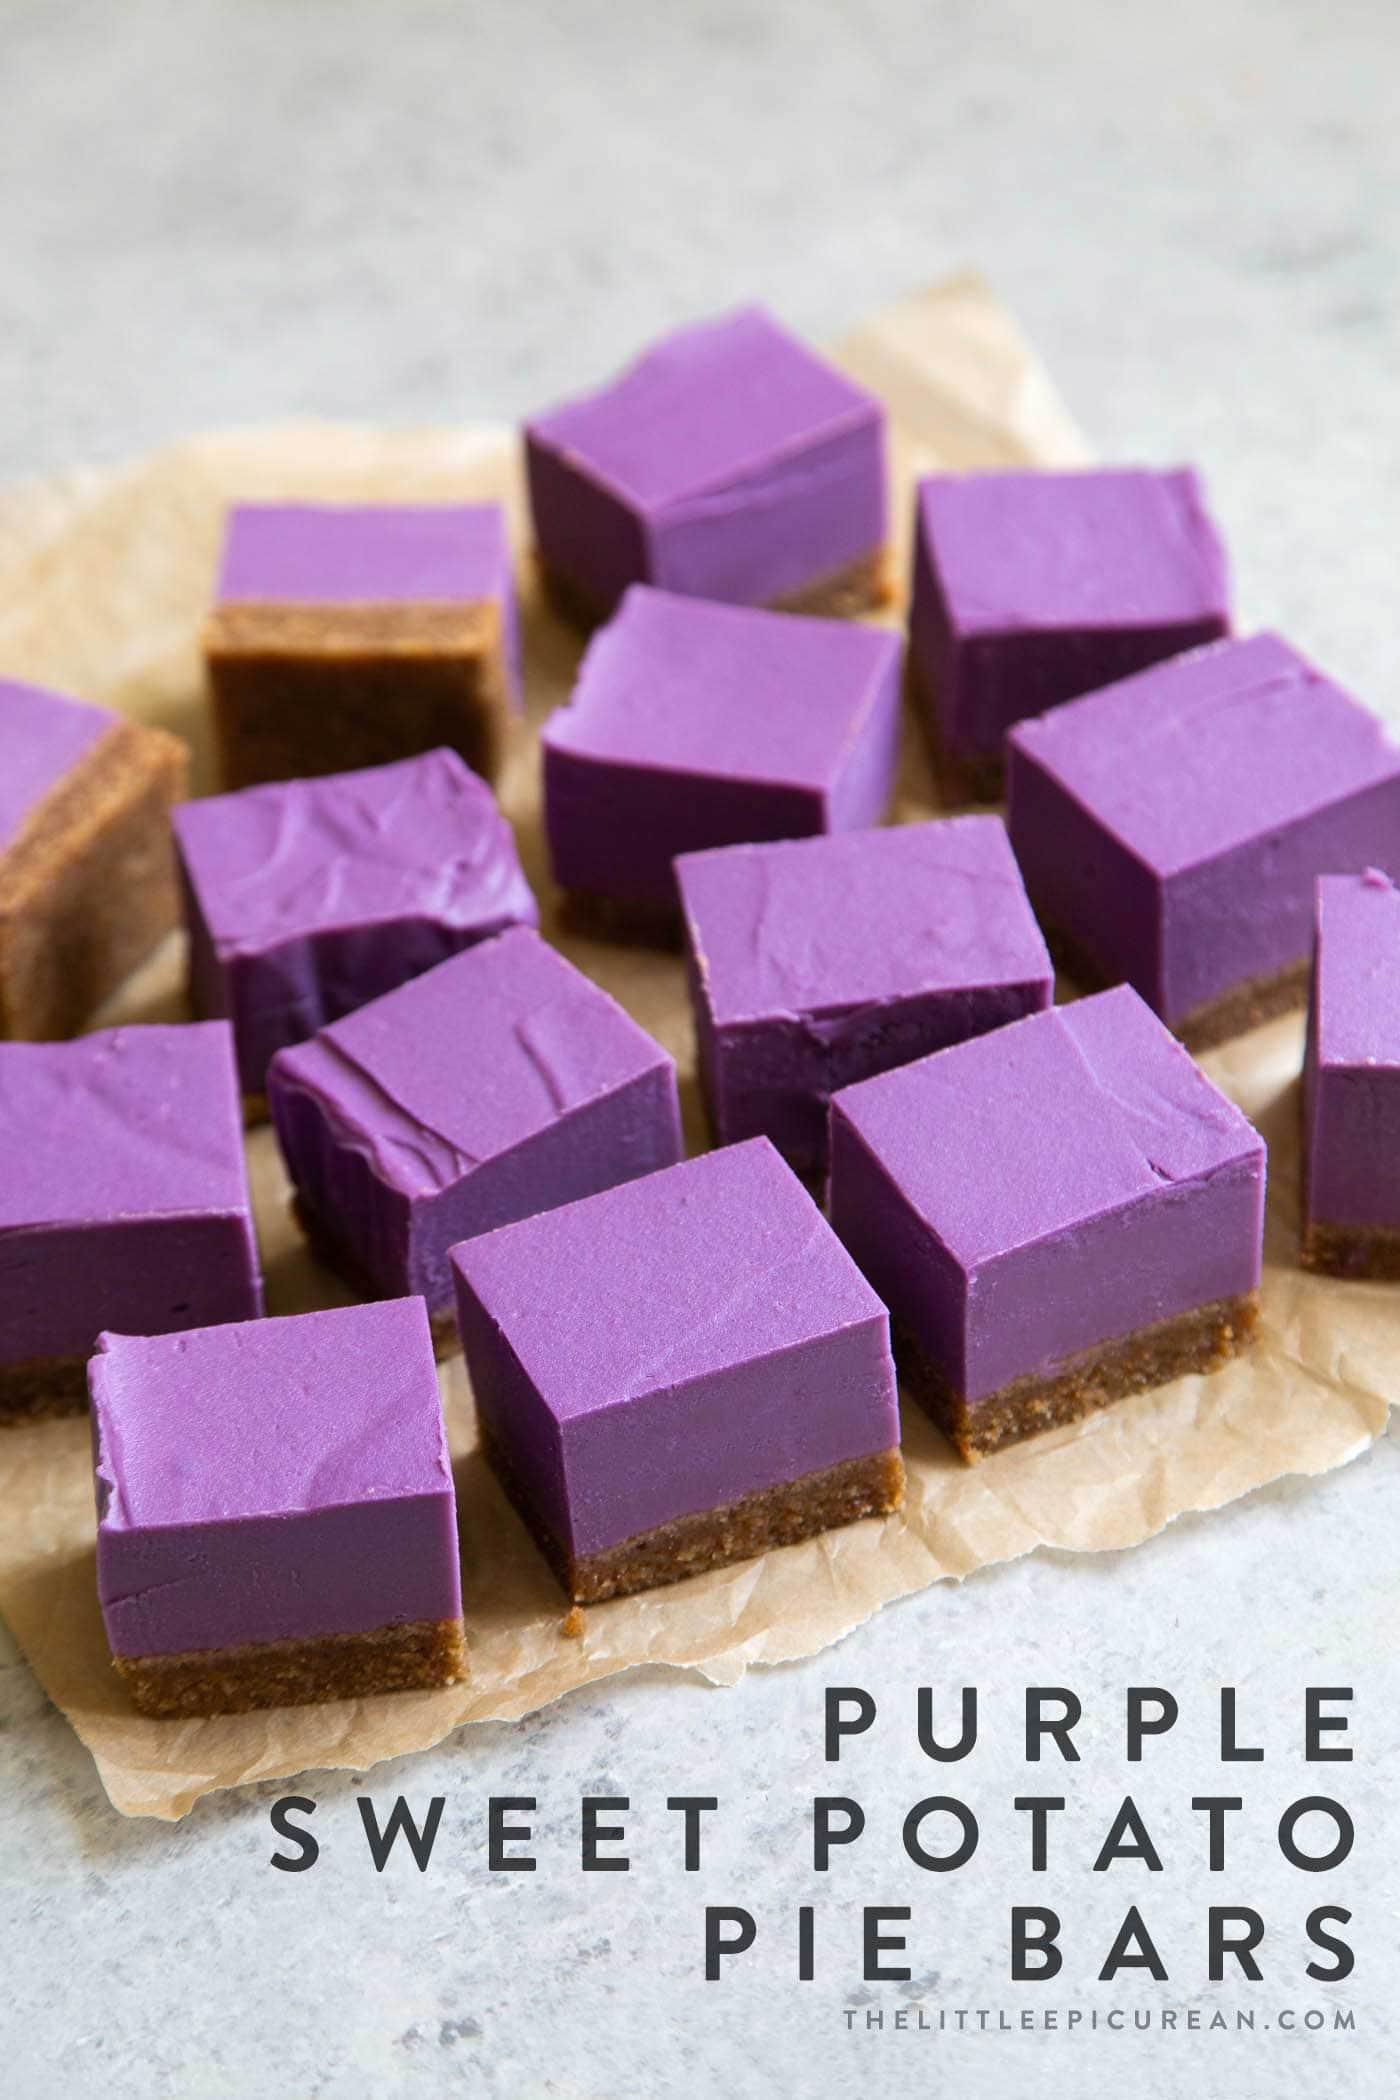 Vegan Purple Sweet Potato Pie Bars with almond butter crust.